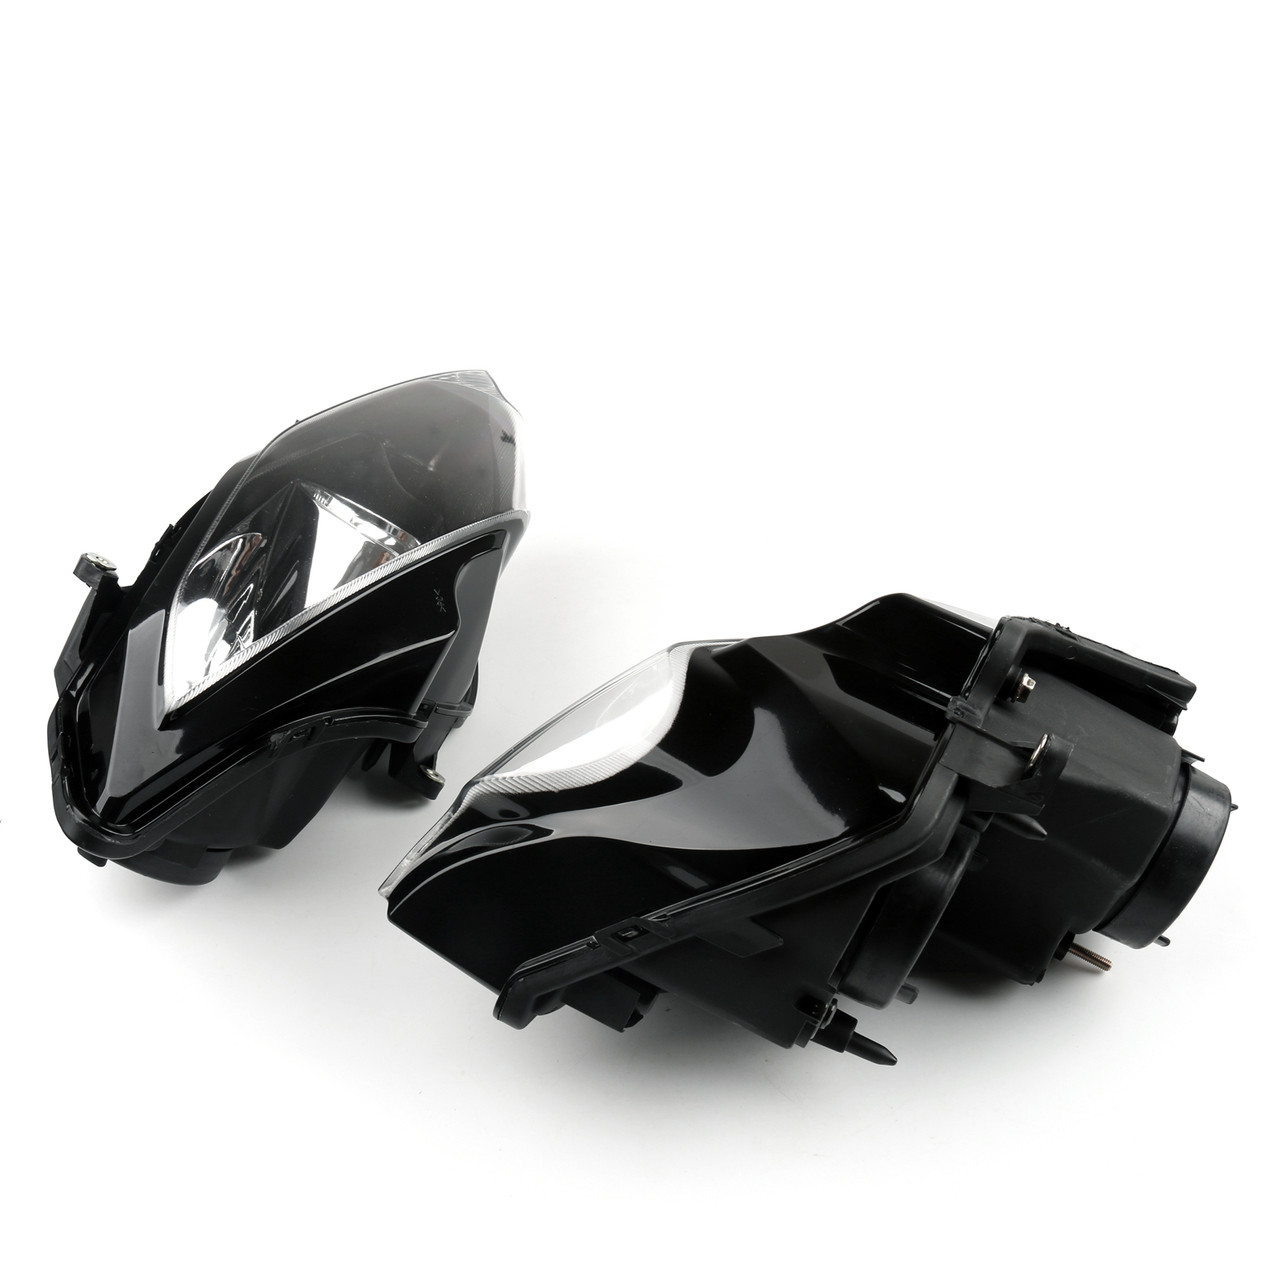 Headlight Assembly Headlamp Honda VFR800 (2002-2012) Clear